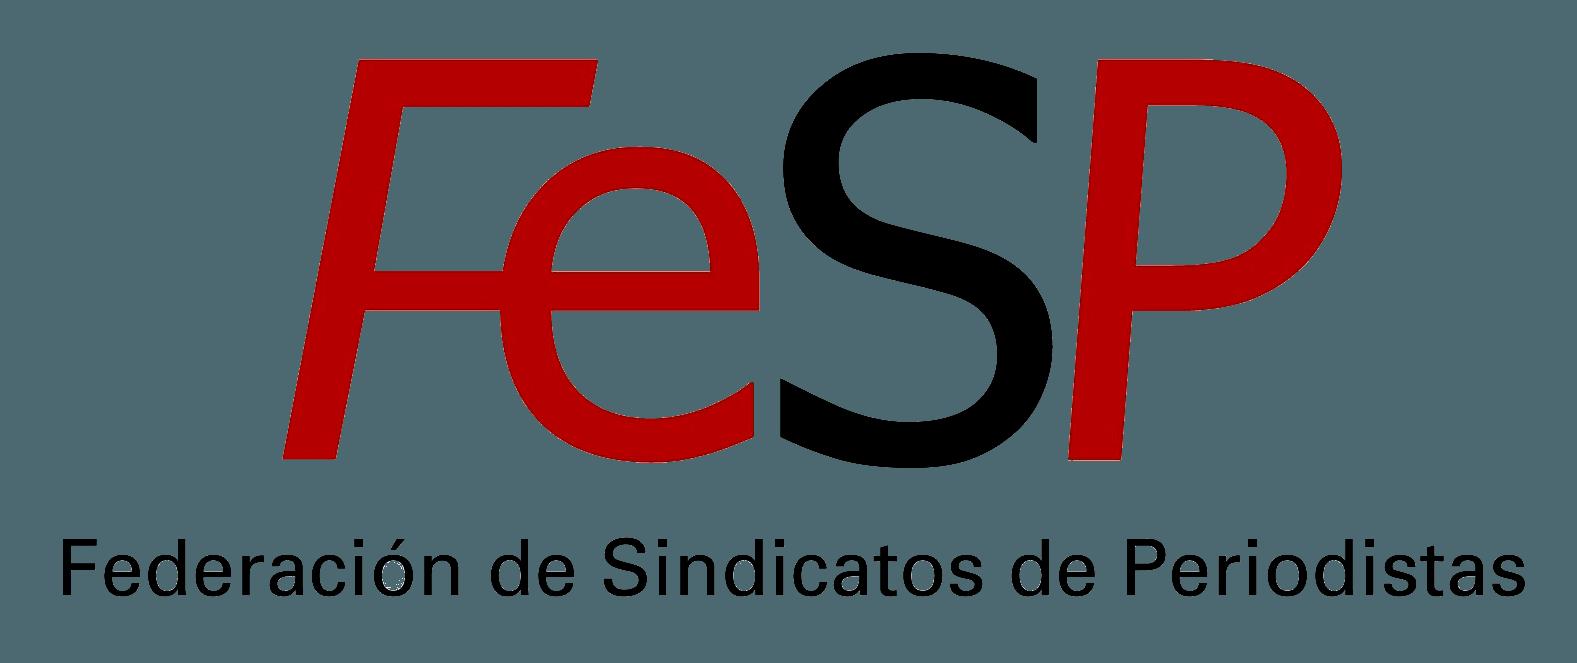 LogoFeSP 2010ok